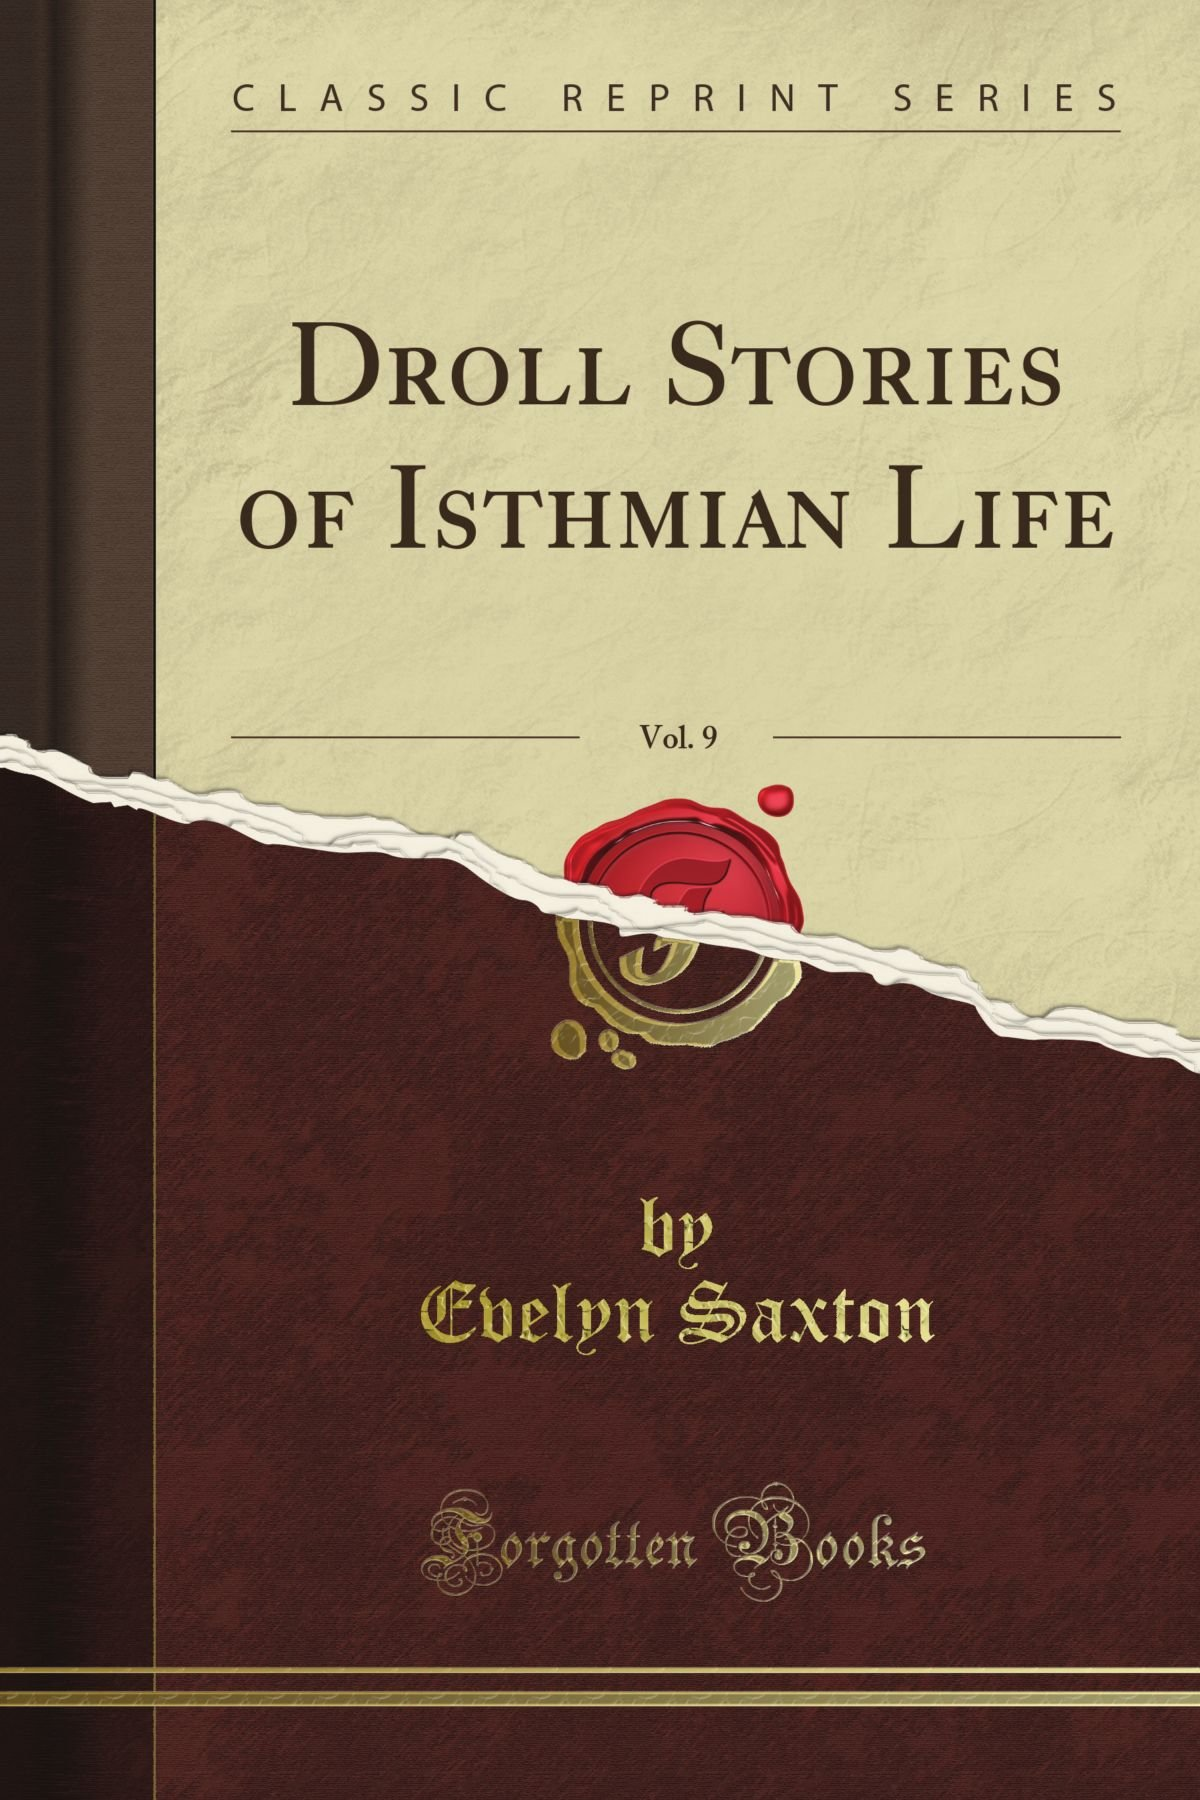 Droll Stories of Isthmian Life, Vol. 9 (Classic Reprint) pdf